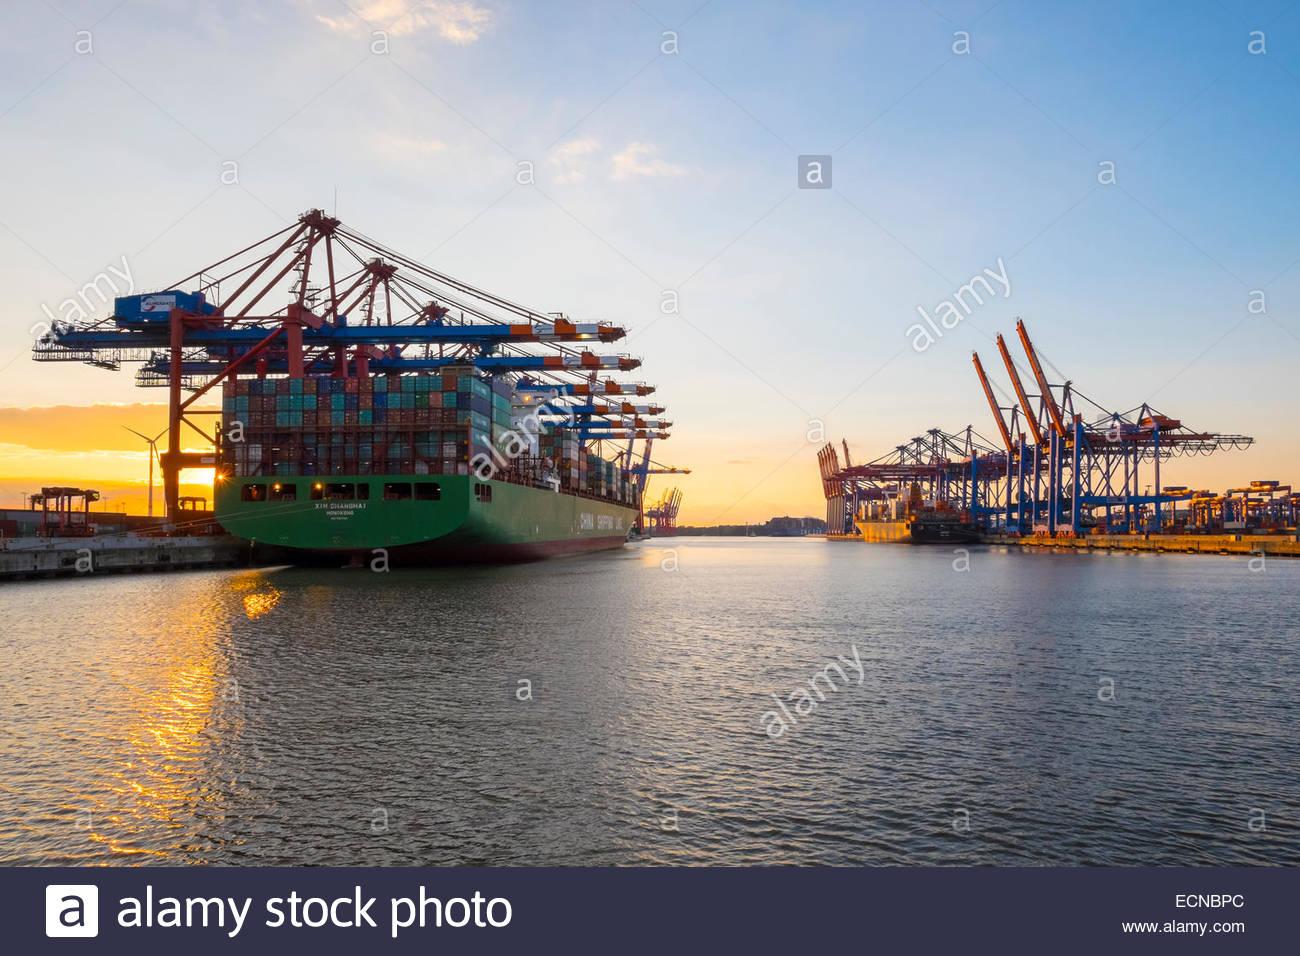 Cargo ships being loaded at Eurokai and Burchardkai in Hamburg Harbor at sunset, Waltershofer Hafen, Hamburg, Germany - Stock Image